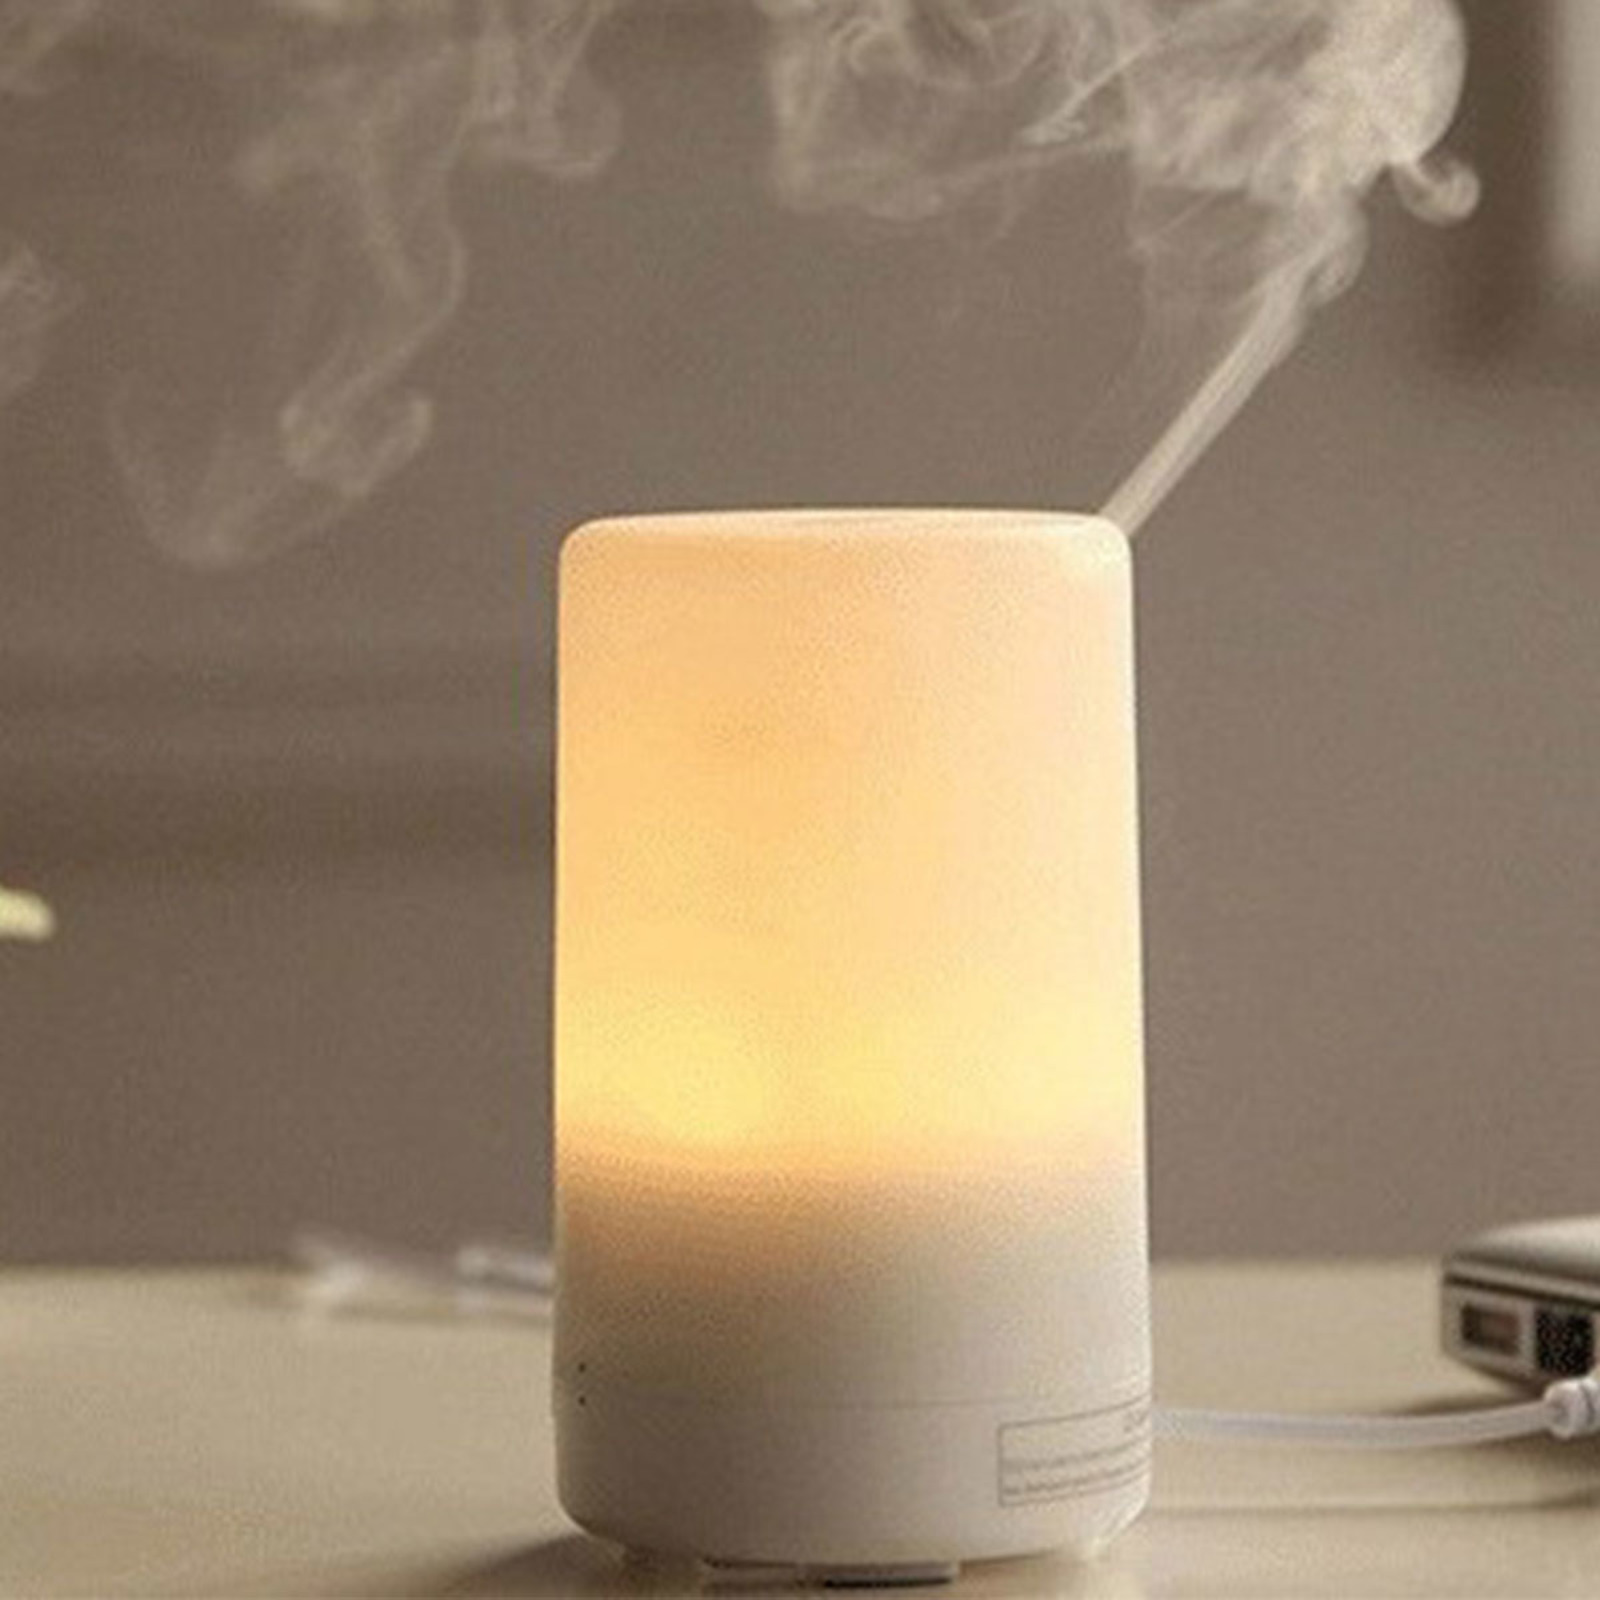 Biofinest U1 Ultrasonic Aroma Diffuser Humidifier